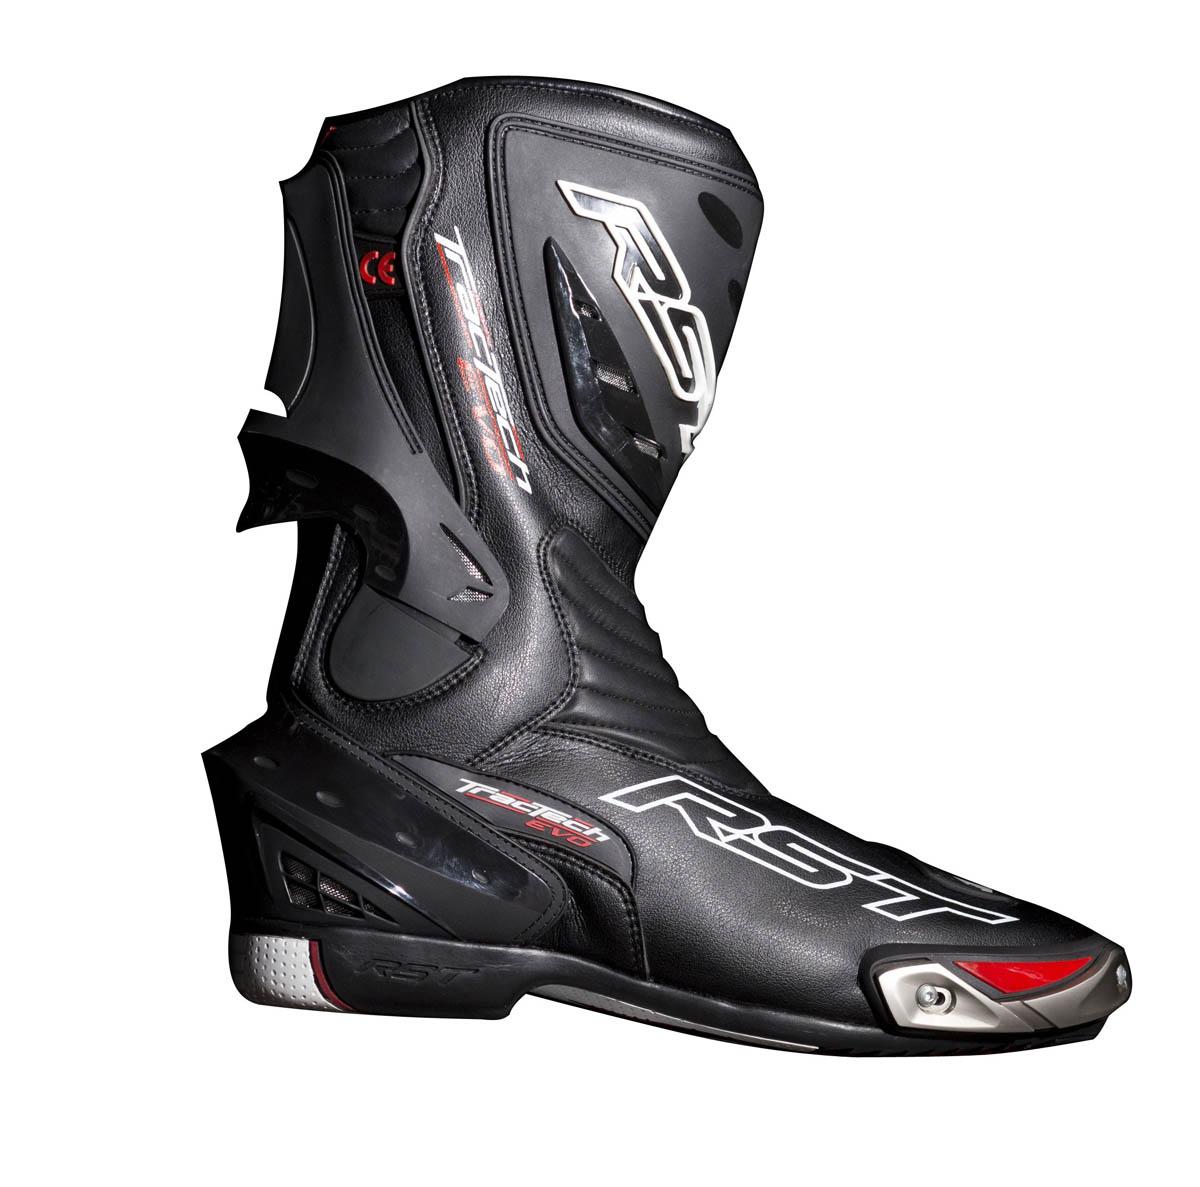 【RST】RST 1568 PARAGON II CE WP 車靴 - 「Webike-摩托百貨」